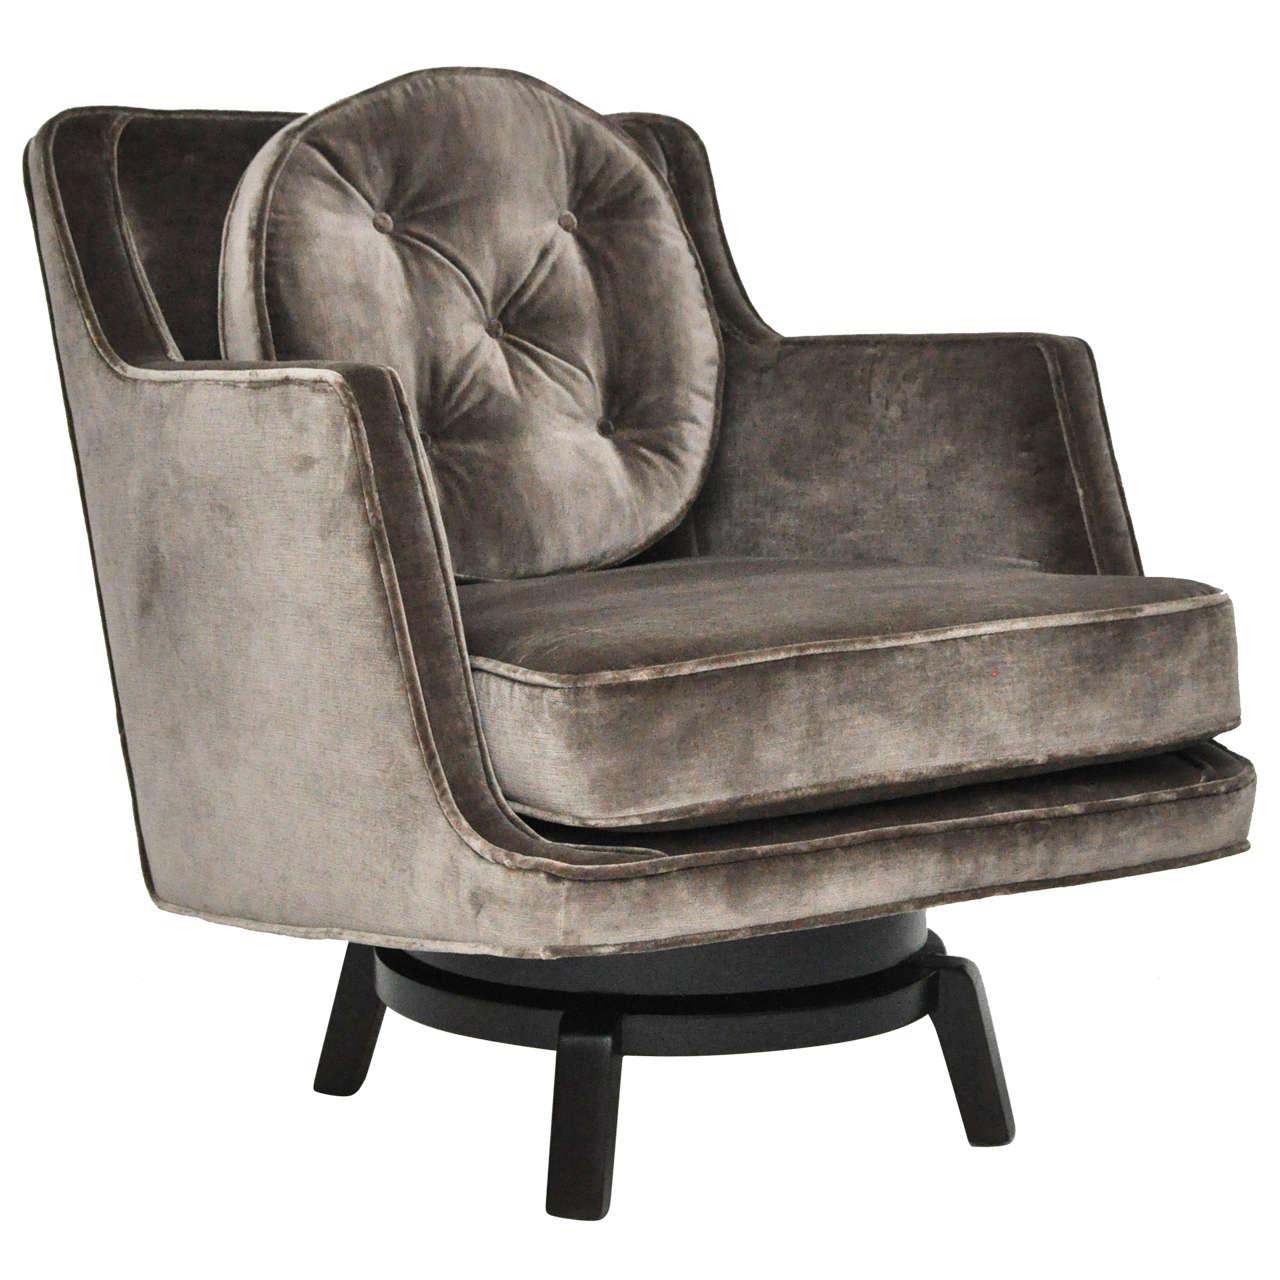 Dunbar swivel chair edward wormley at 1stdibs - Edward wormley chairs ...